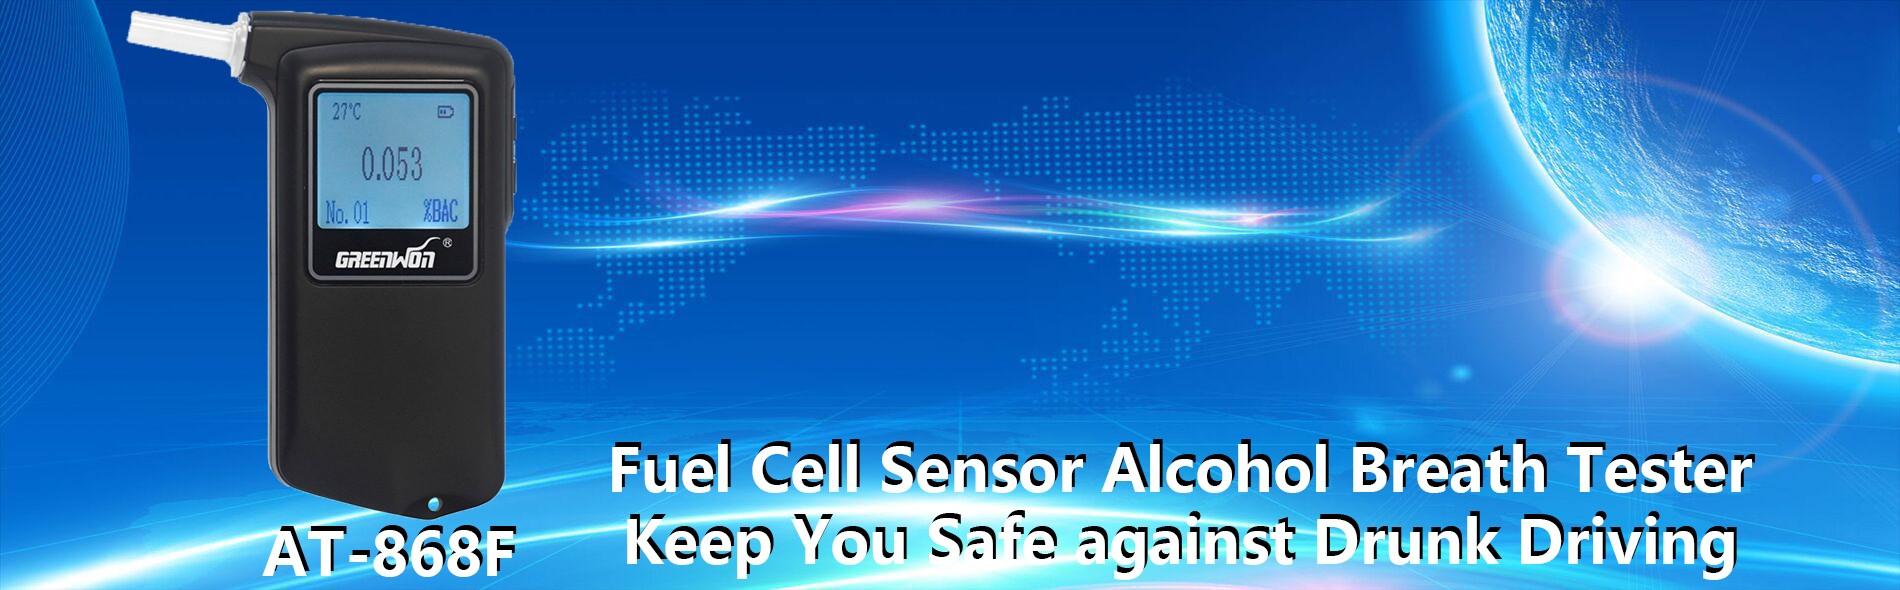 Fuel cell sensor alcohol breath tester